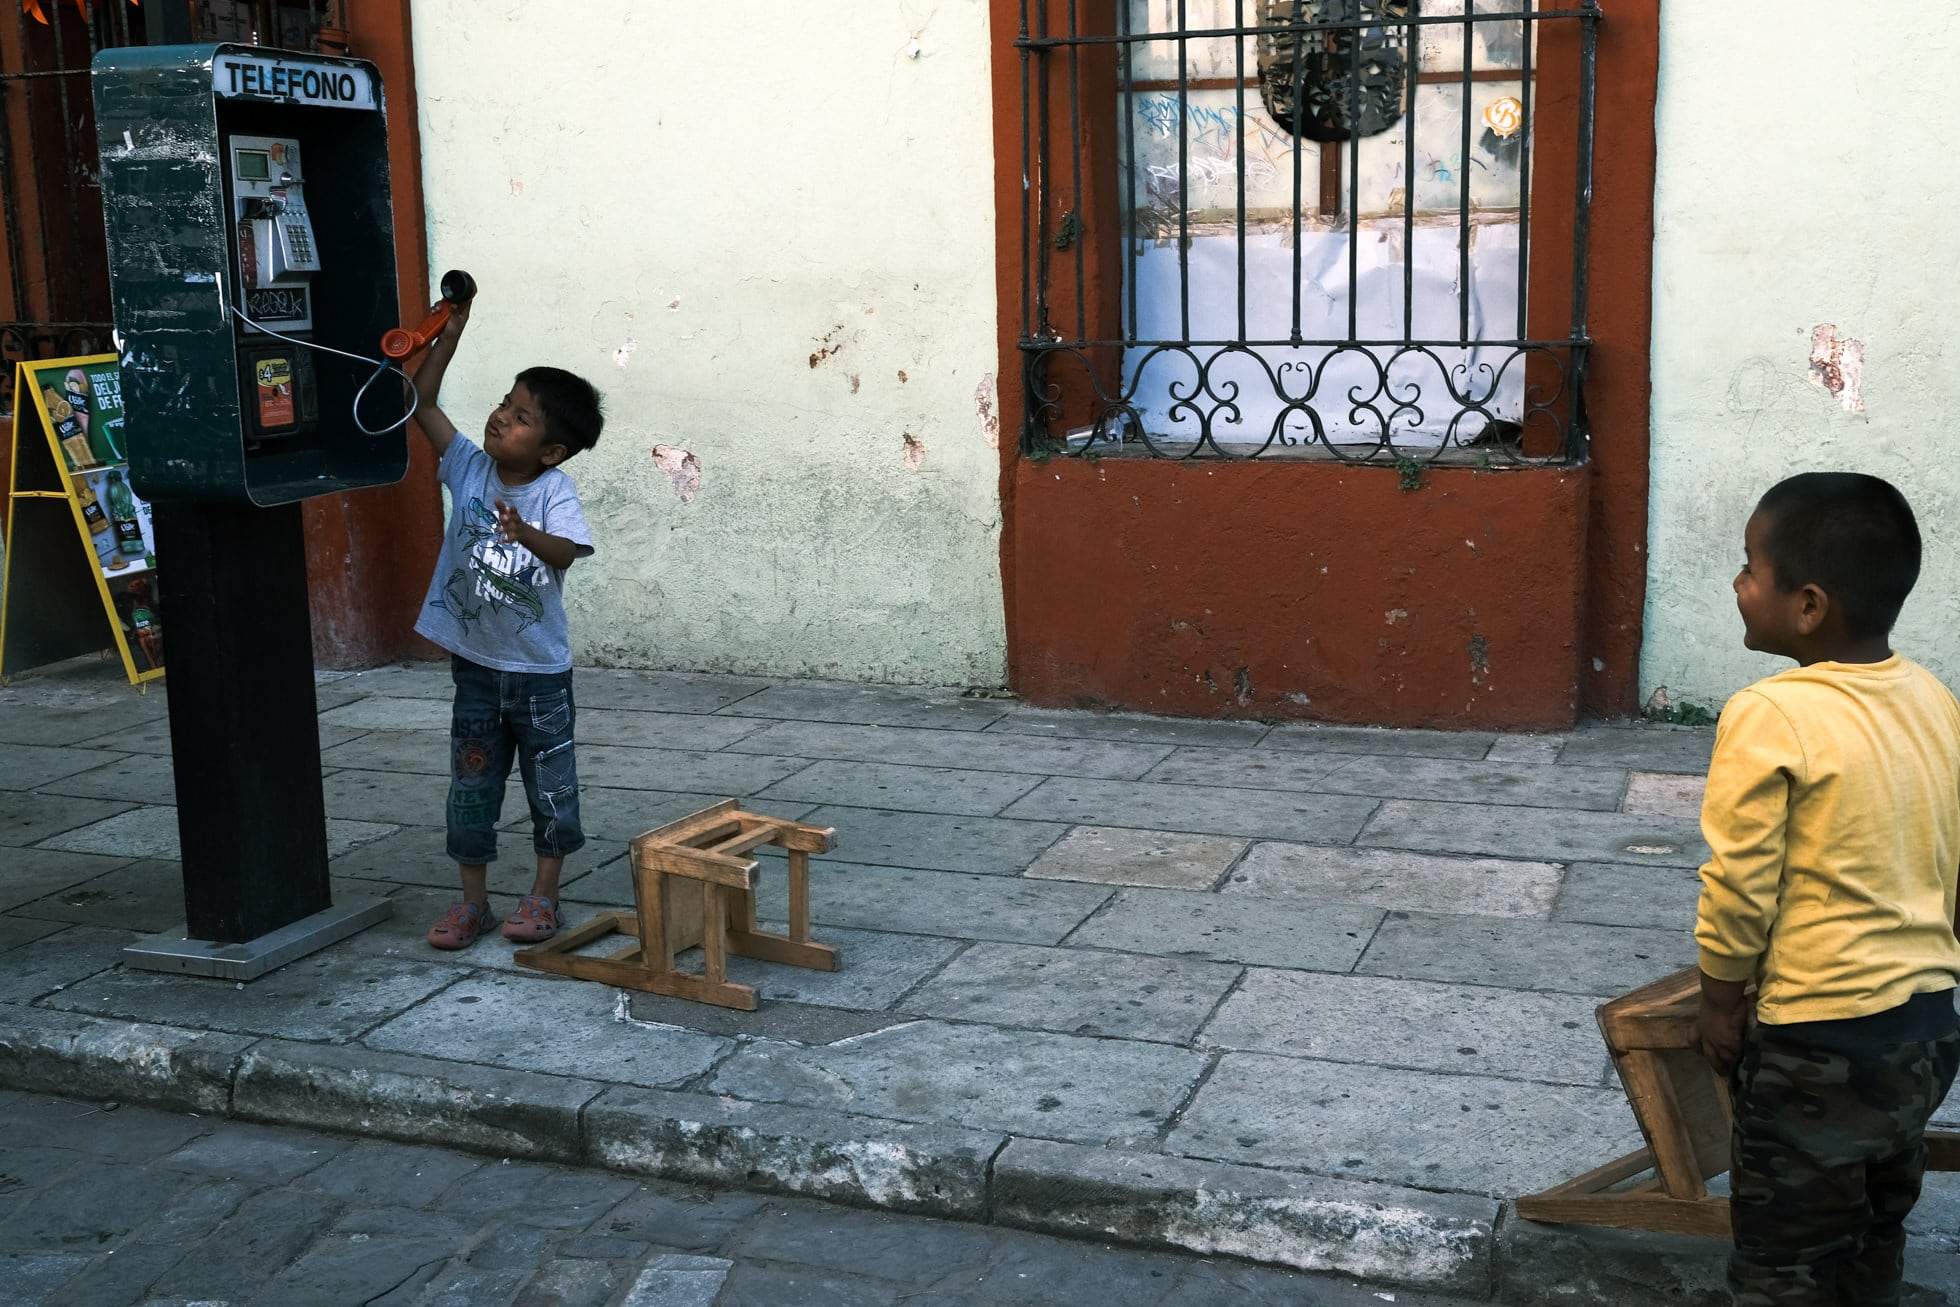 fujifilm-x-pro3-mexico-street-photography-25